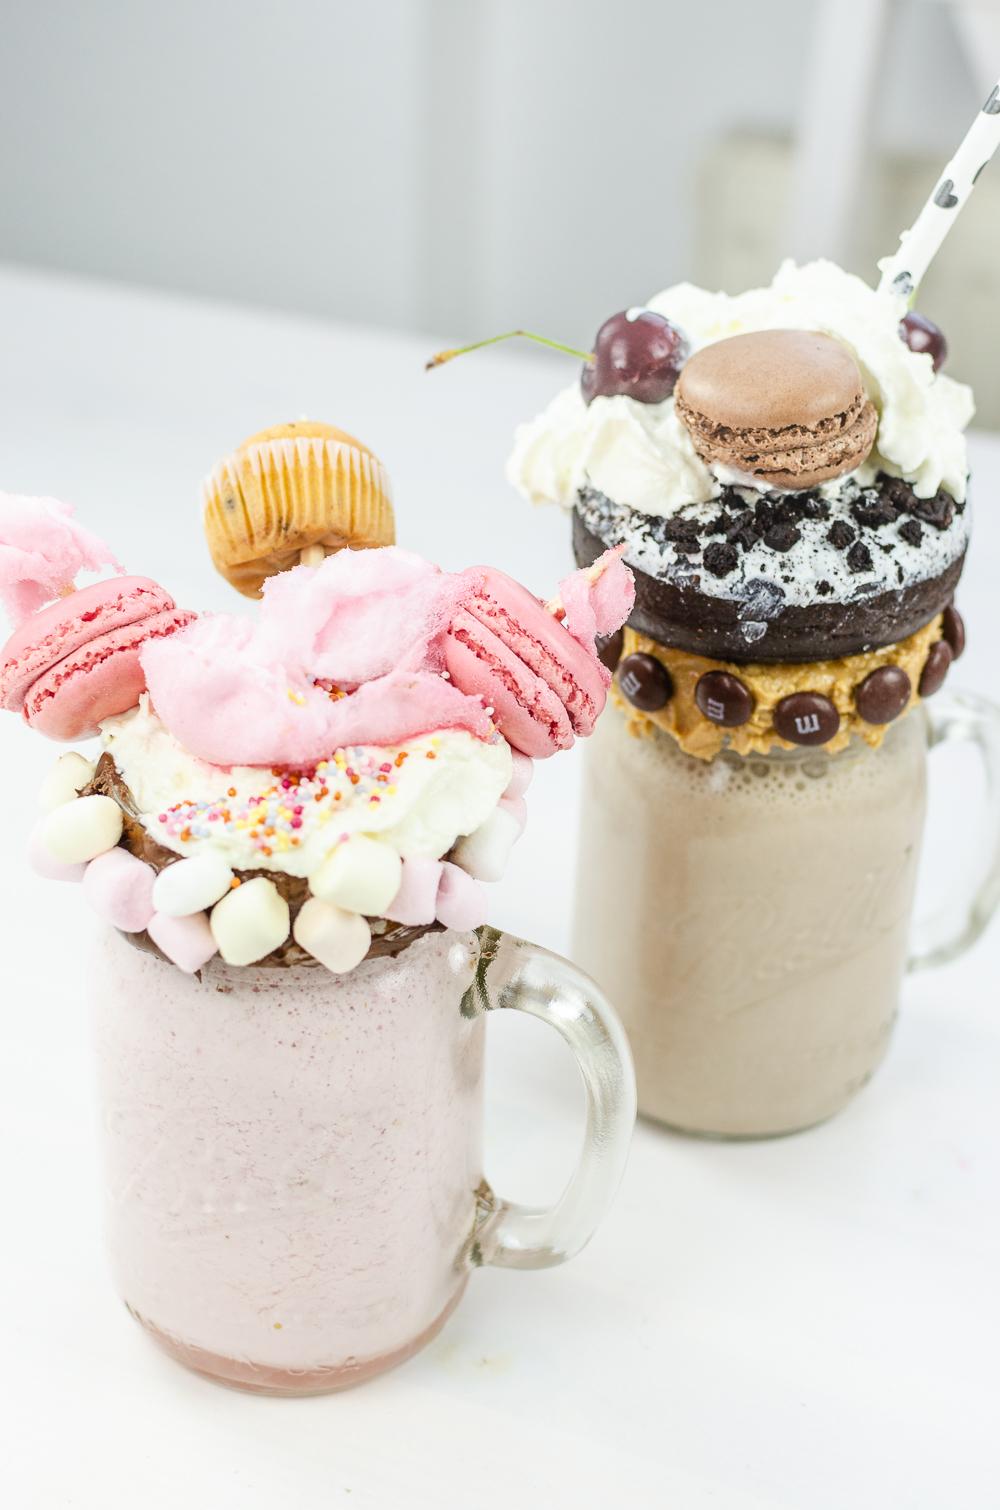 Rezept für Freakshakes-Monster Milchshakes-Rezept Milchshake-Foodblogger-andysparkles